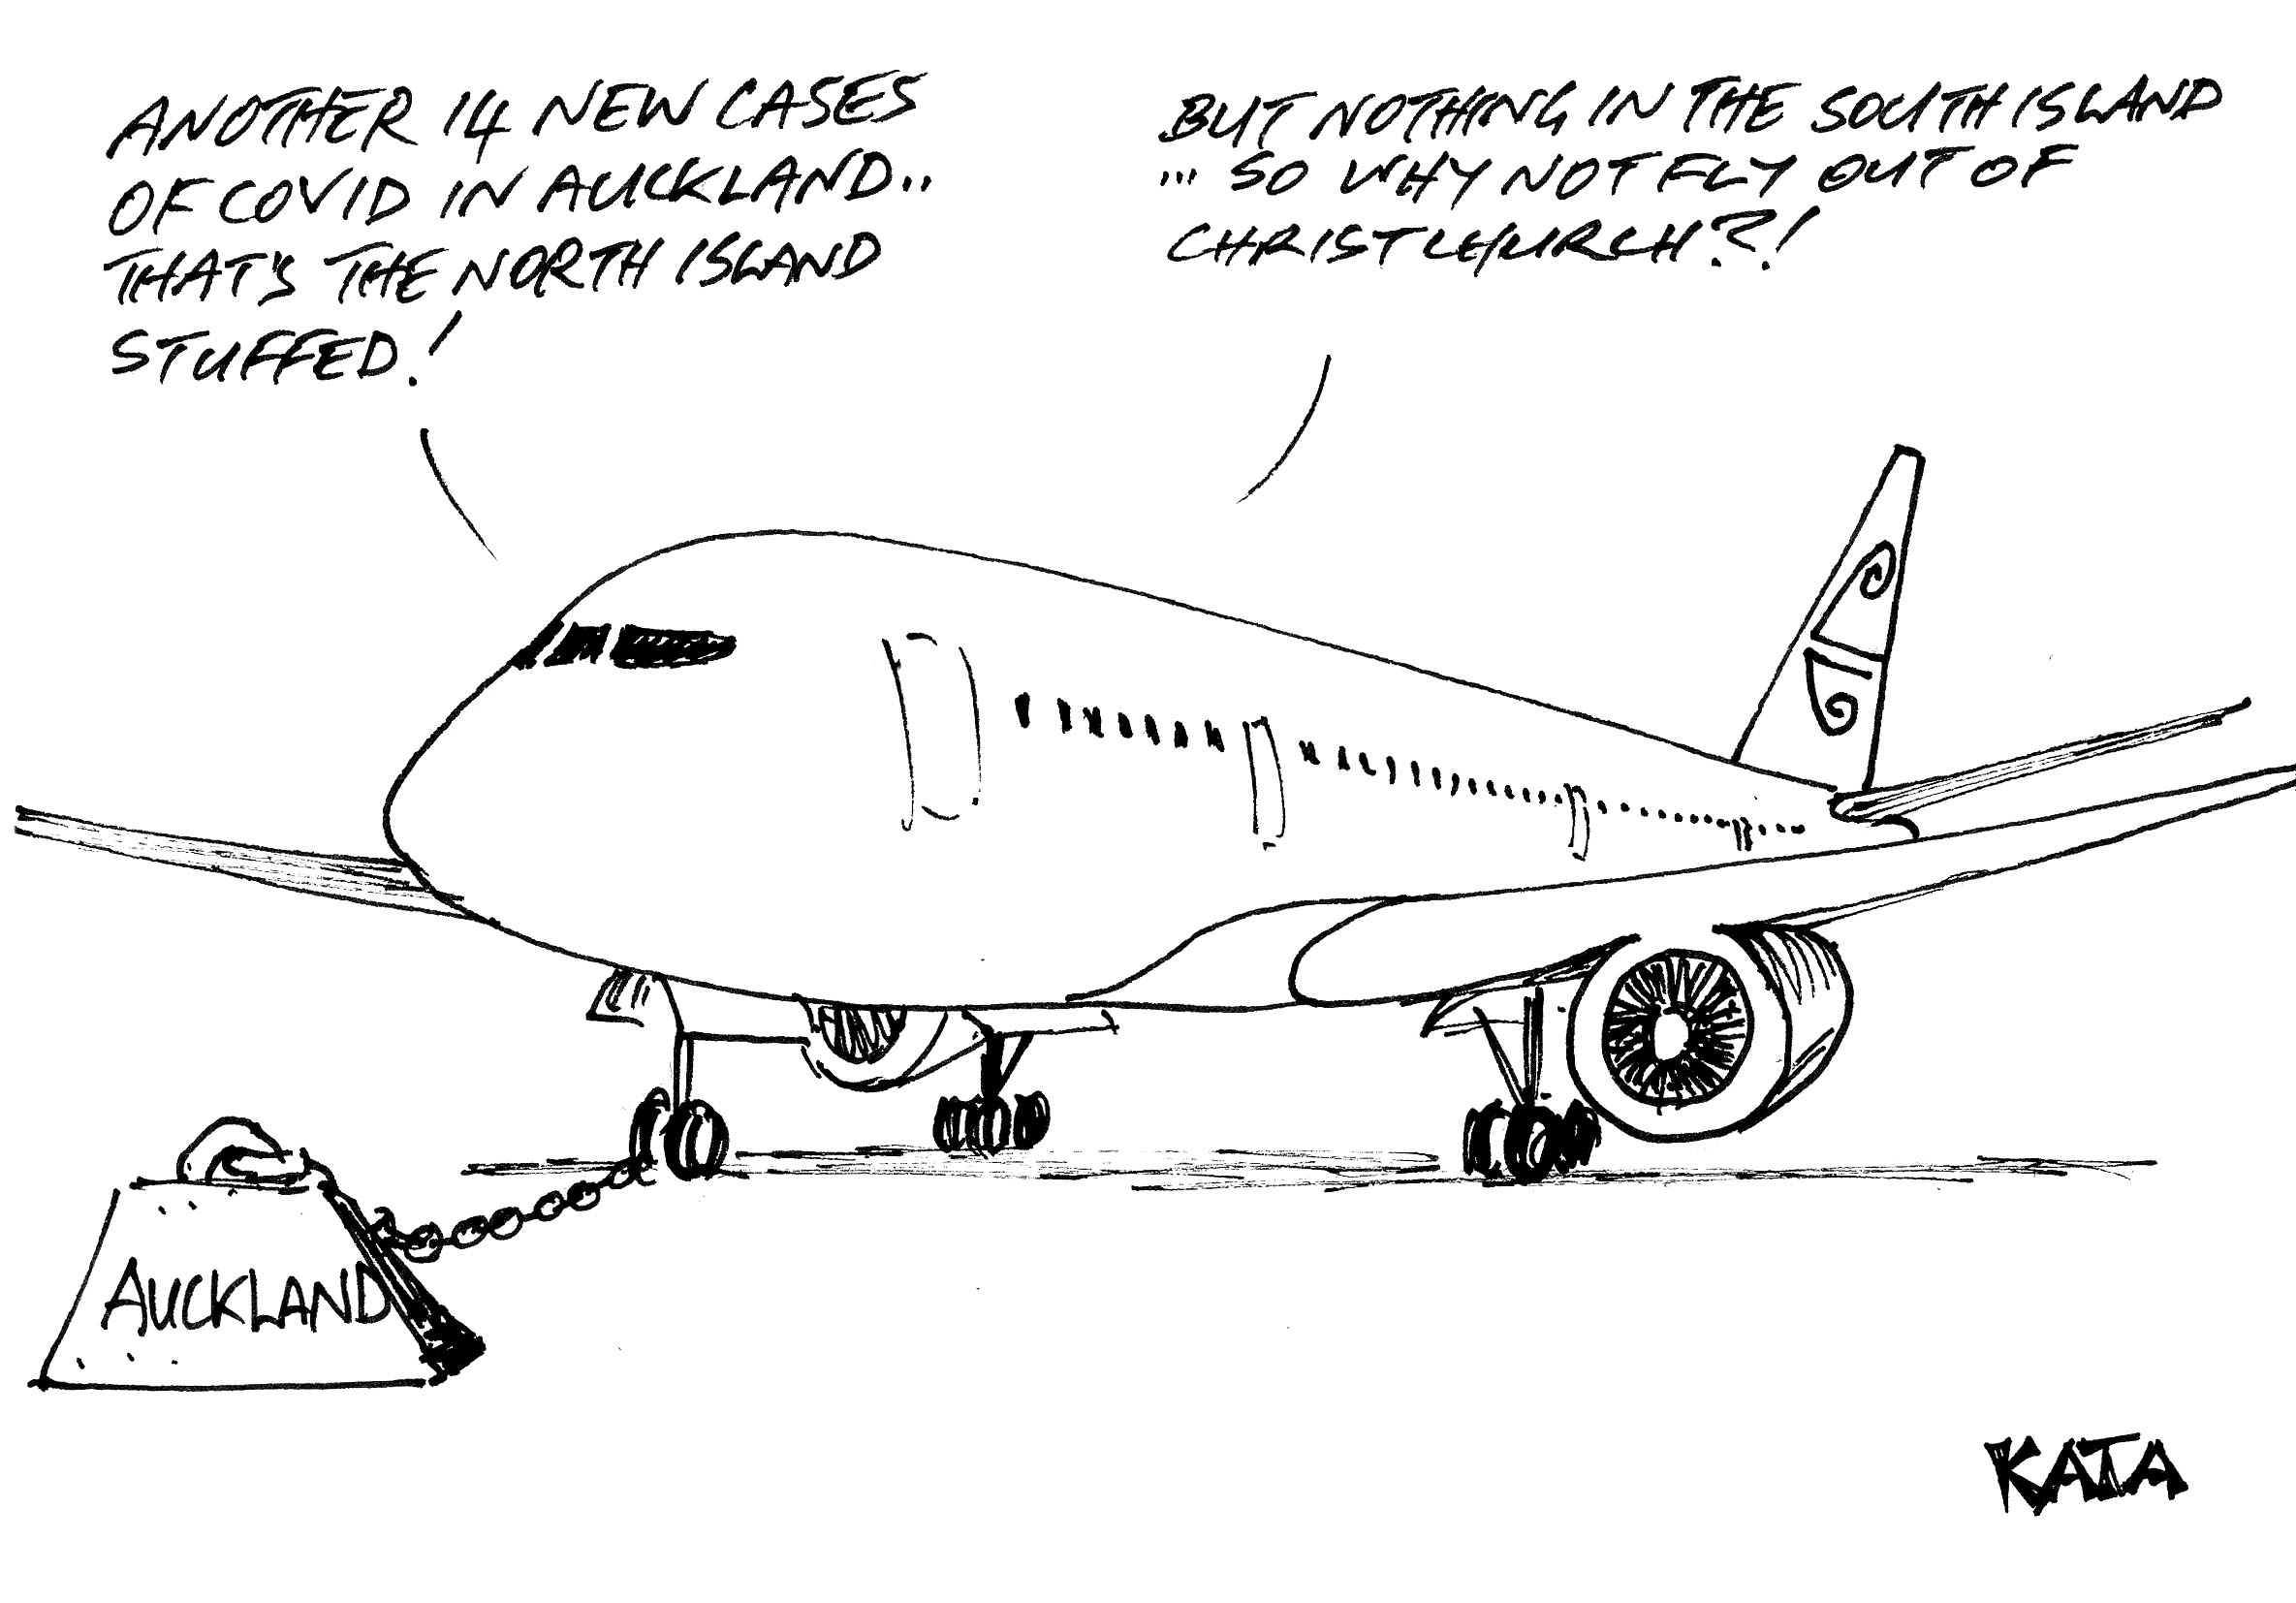 KATA: South Island flights?